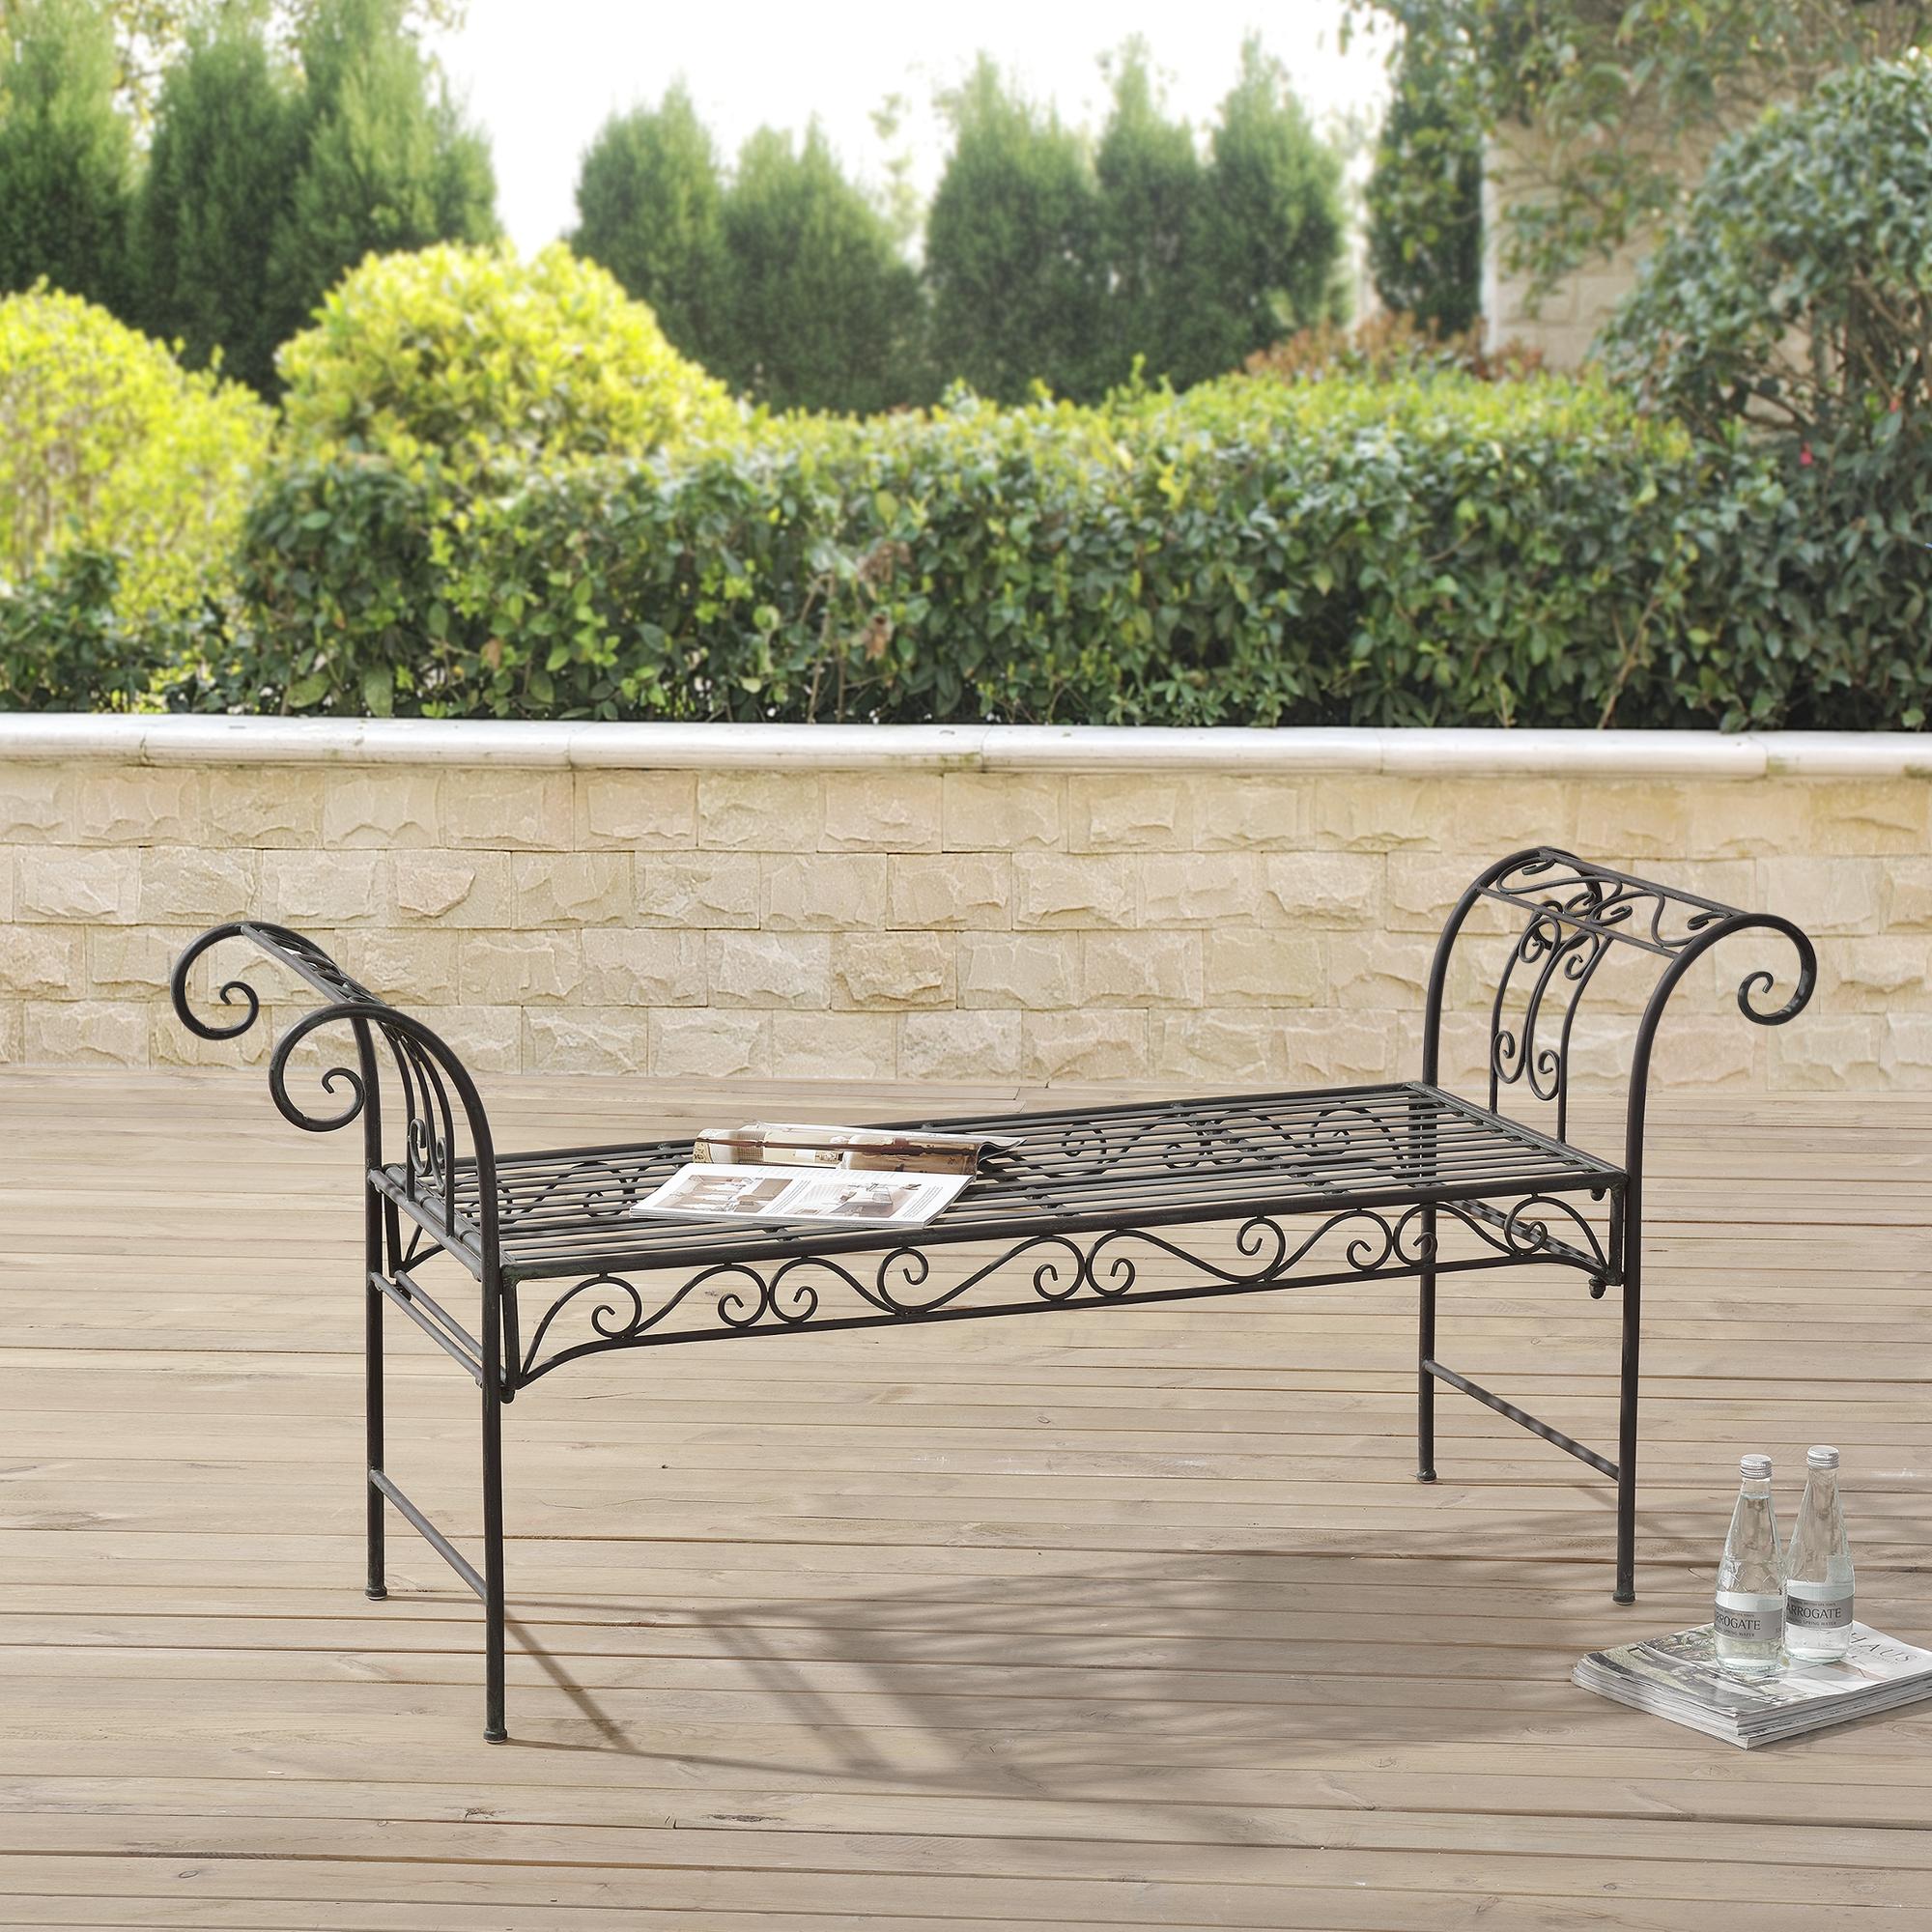 m tal banc de jardin banc banc de jardin si ge. Black Bedroom Furniture Sets. Home Design Ideas